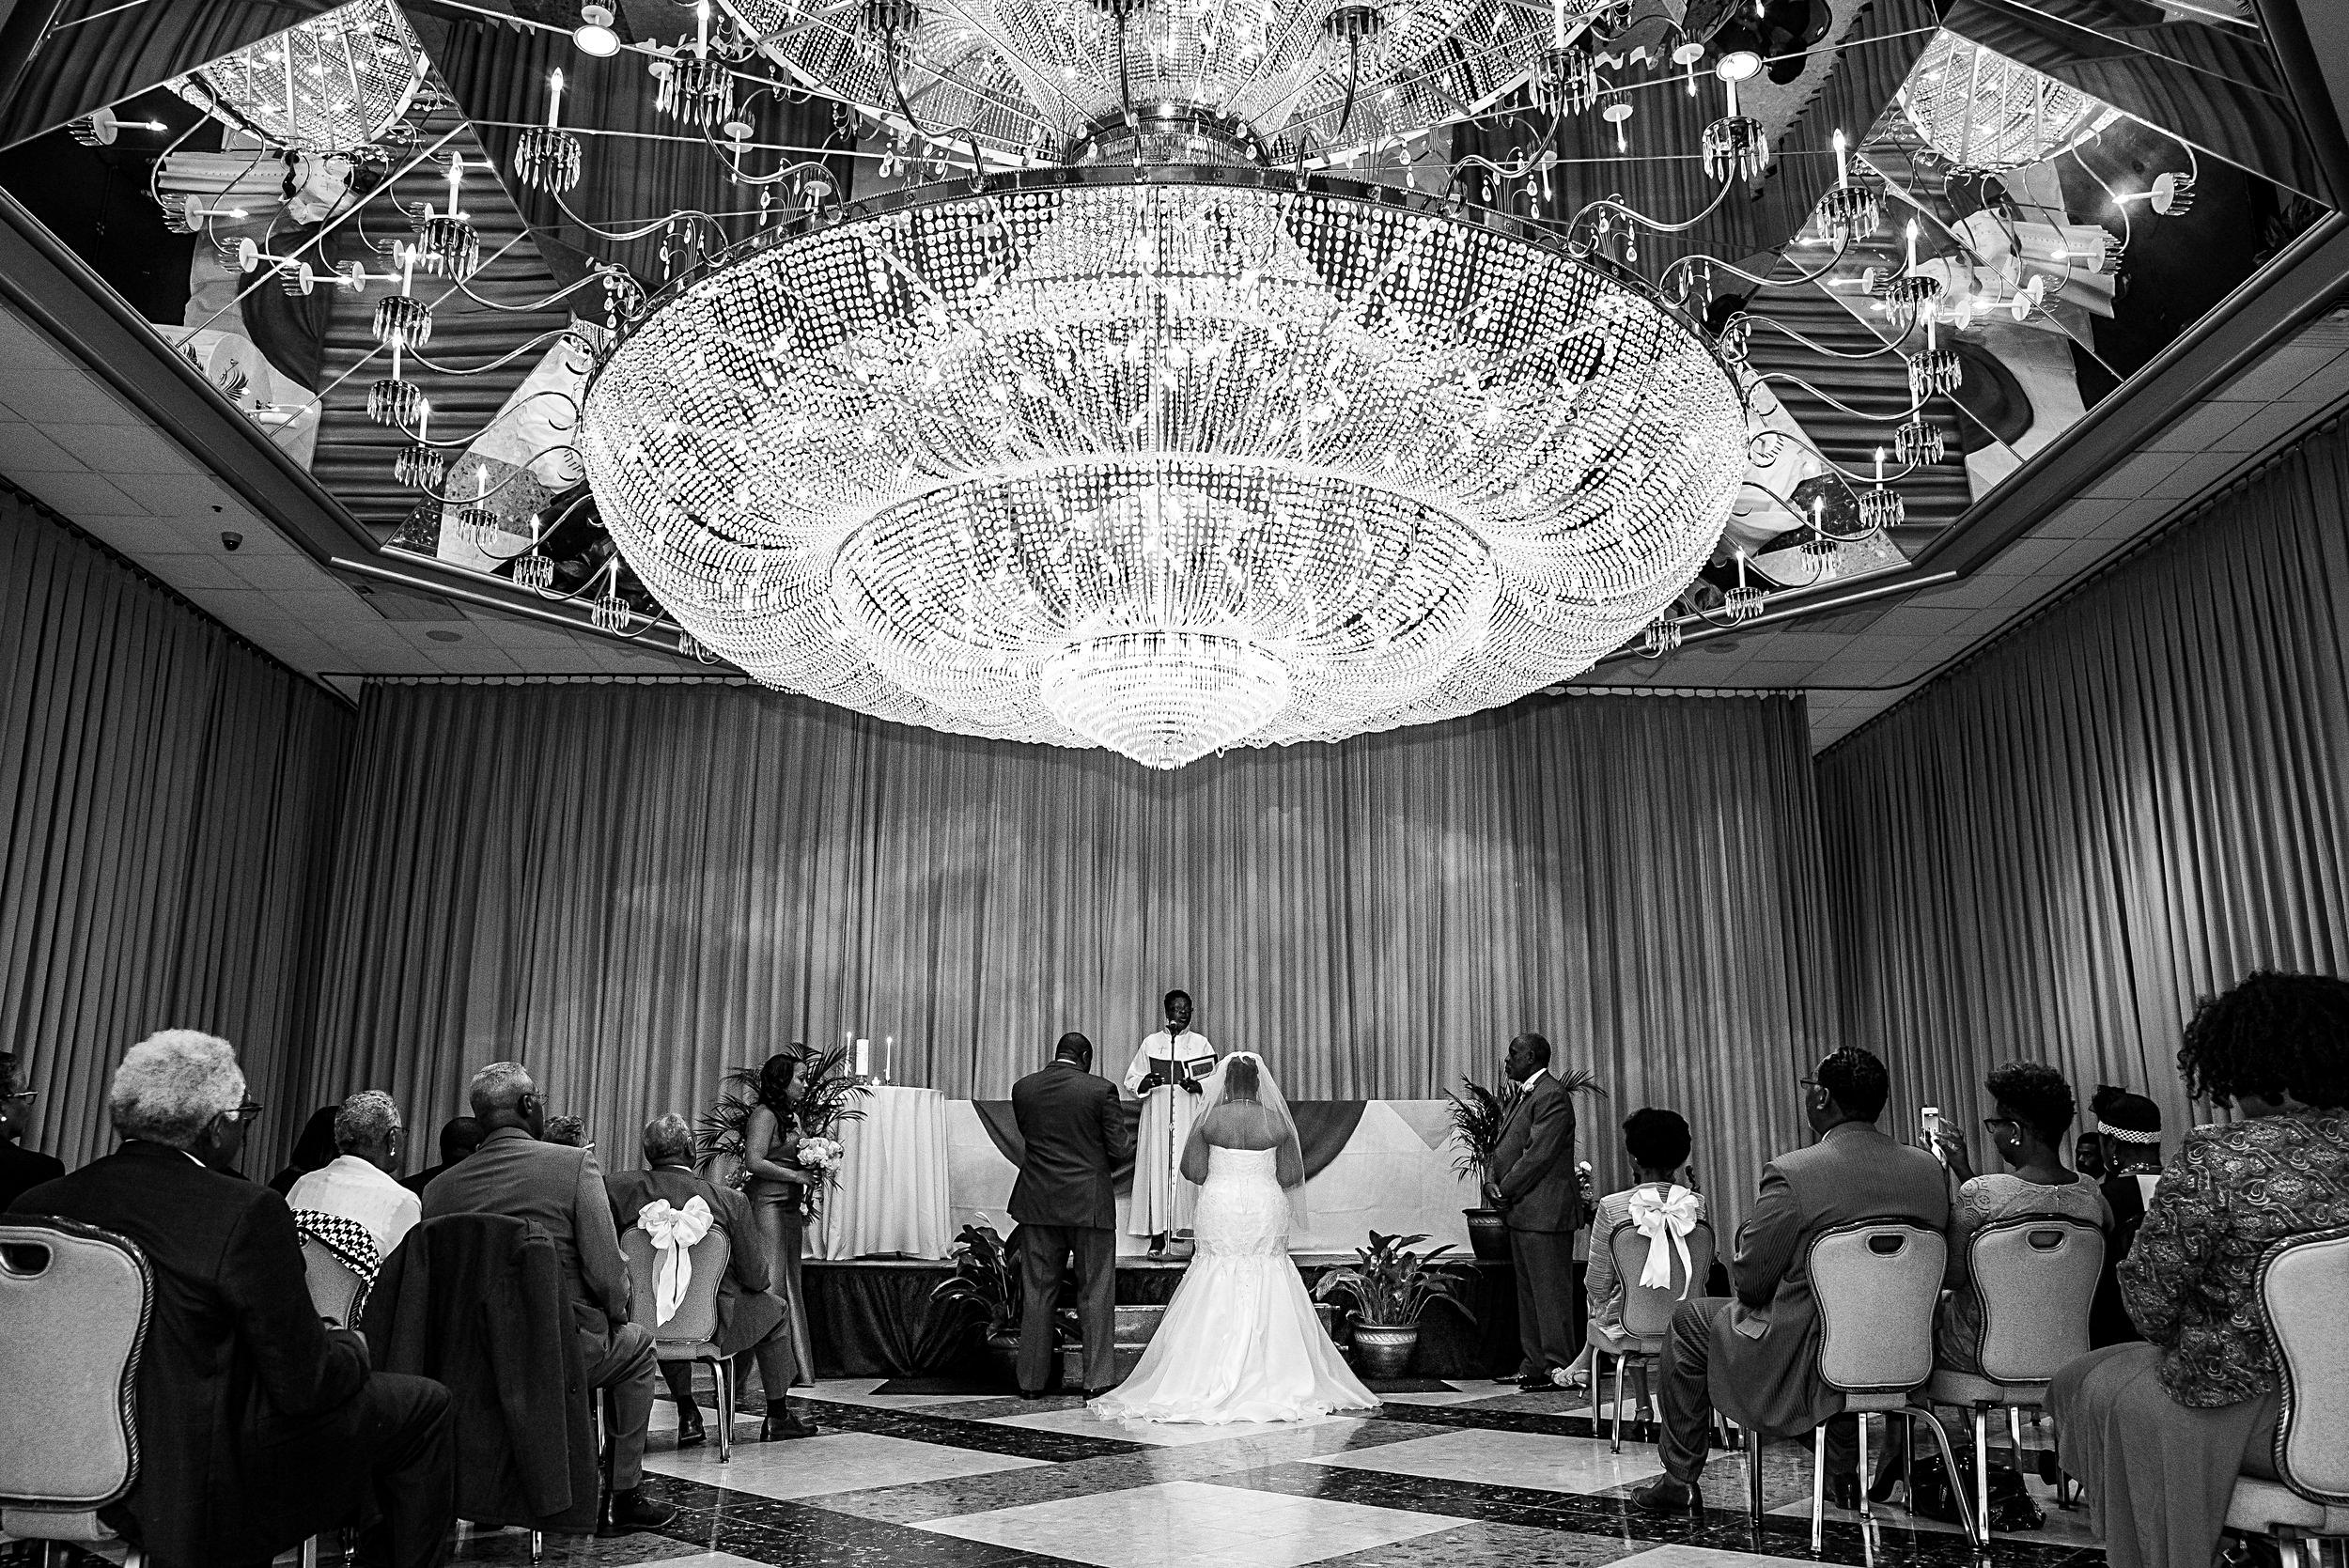 eyeobee weddings - Testimonials IOB_3588-2.jpg